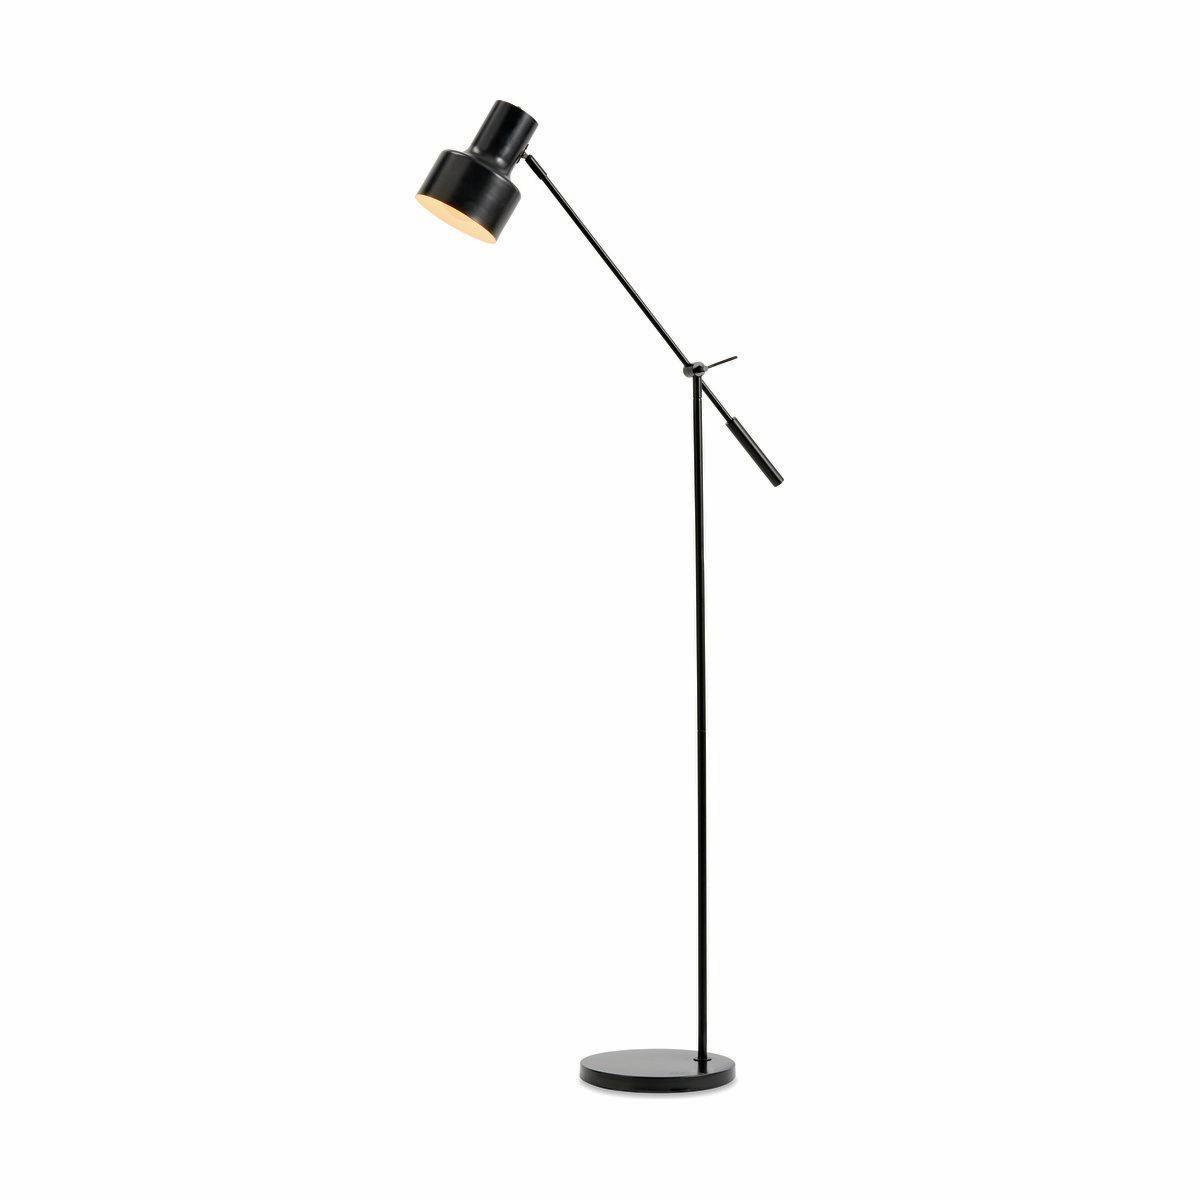 Urban Angled Floor Lamp - $39